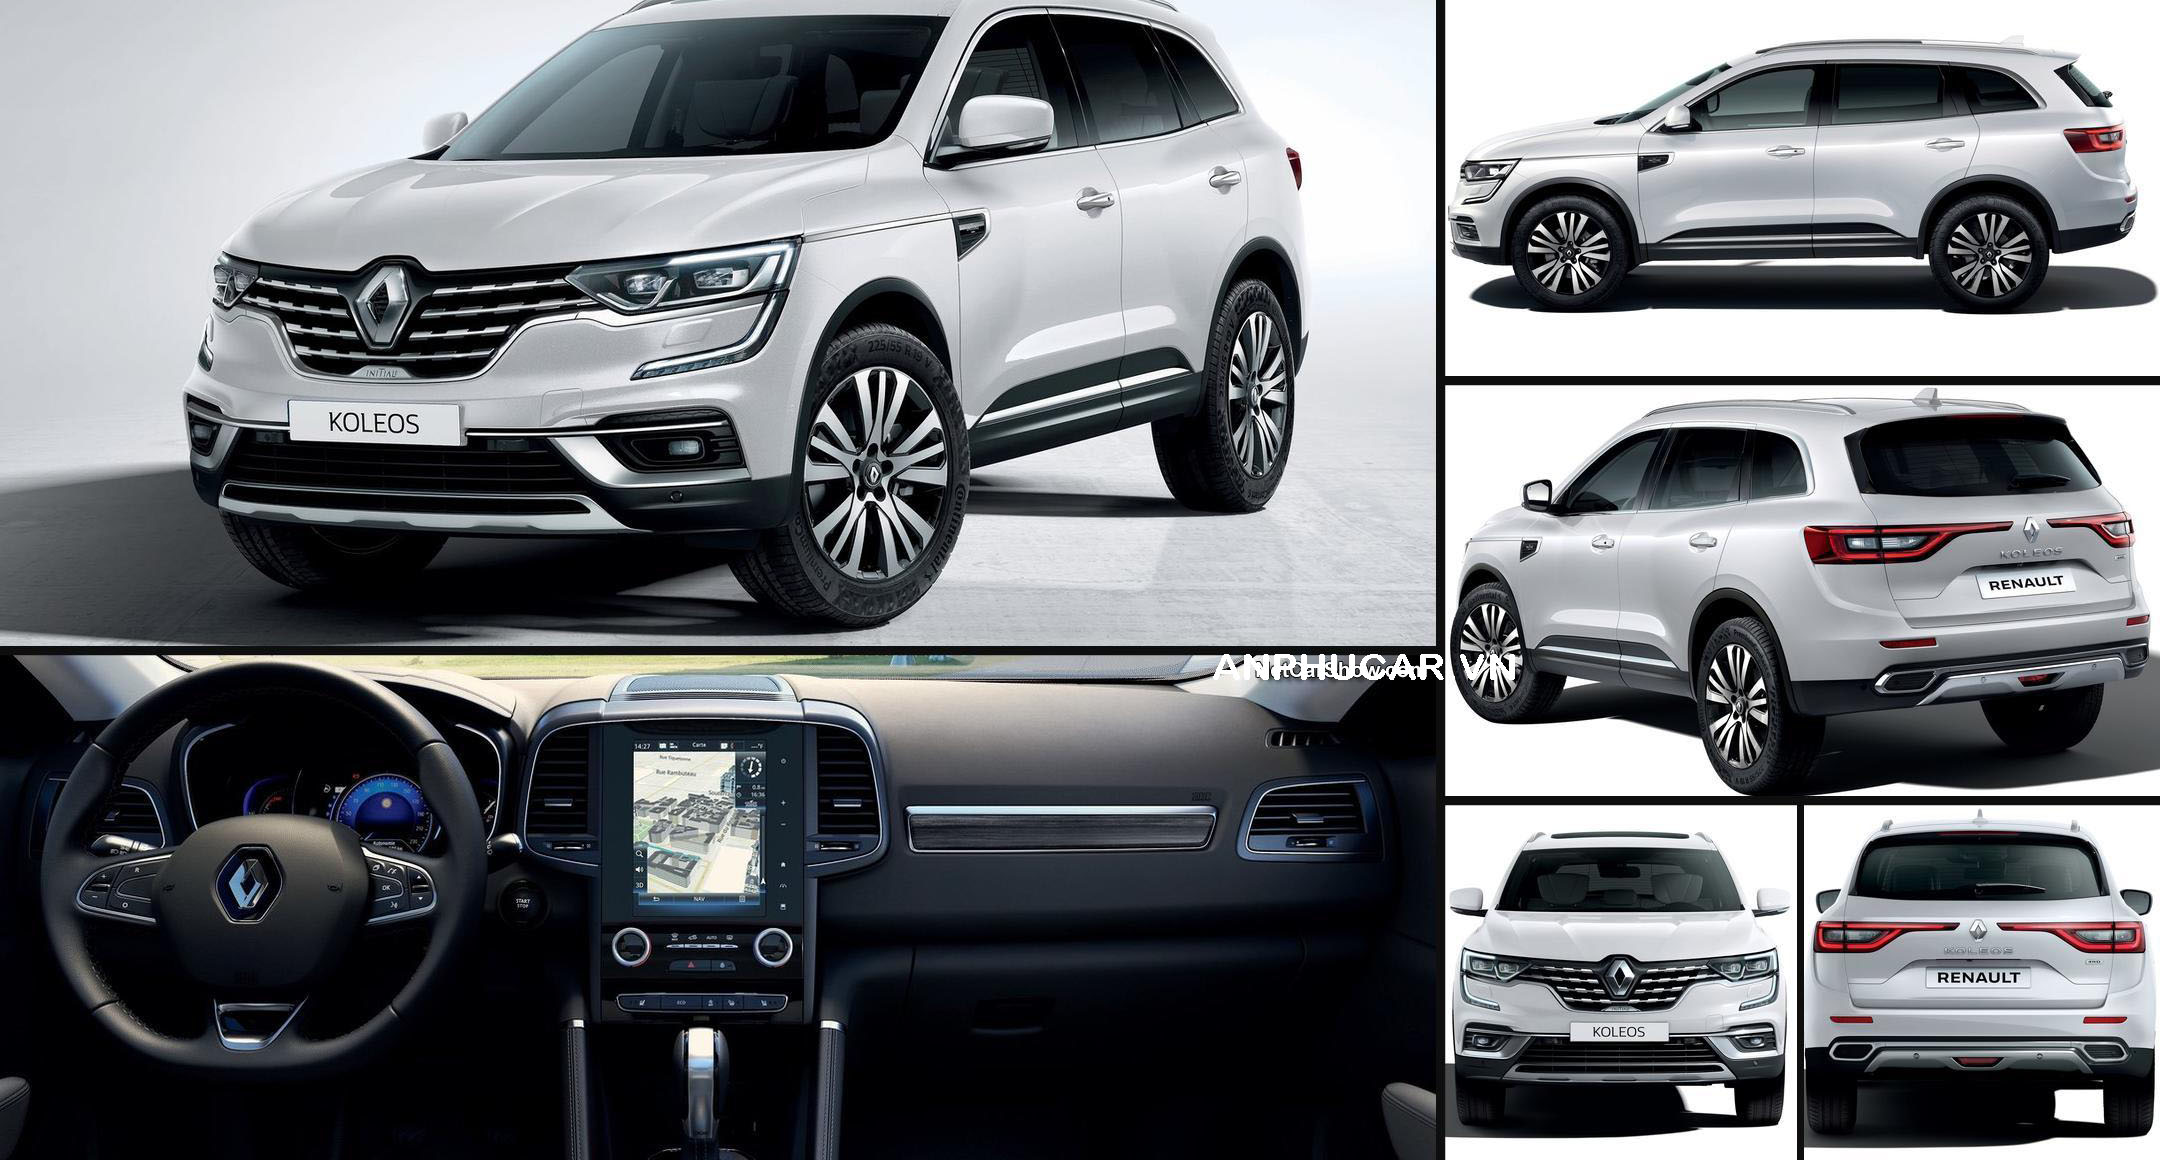 Renault Koleos 2020 tổng quát xe Renault Koleos 2020